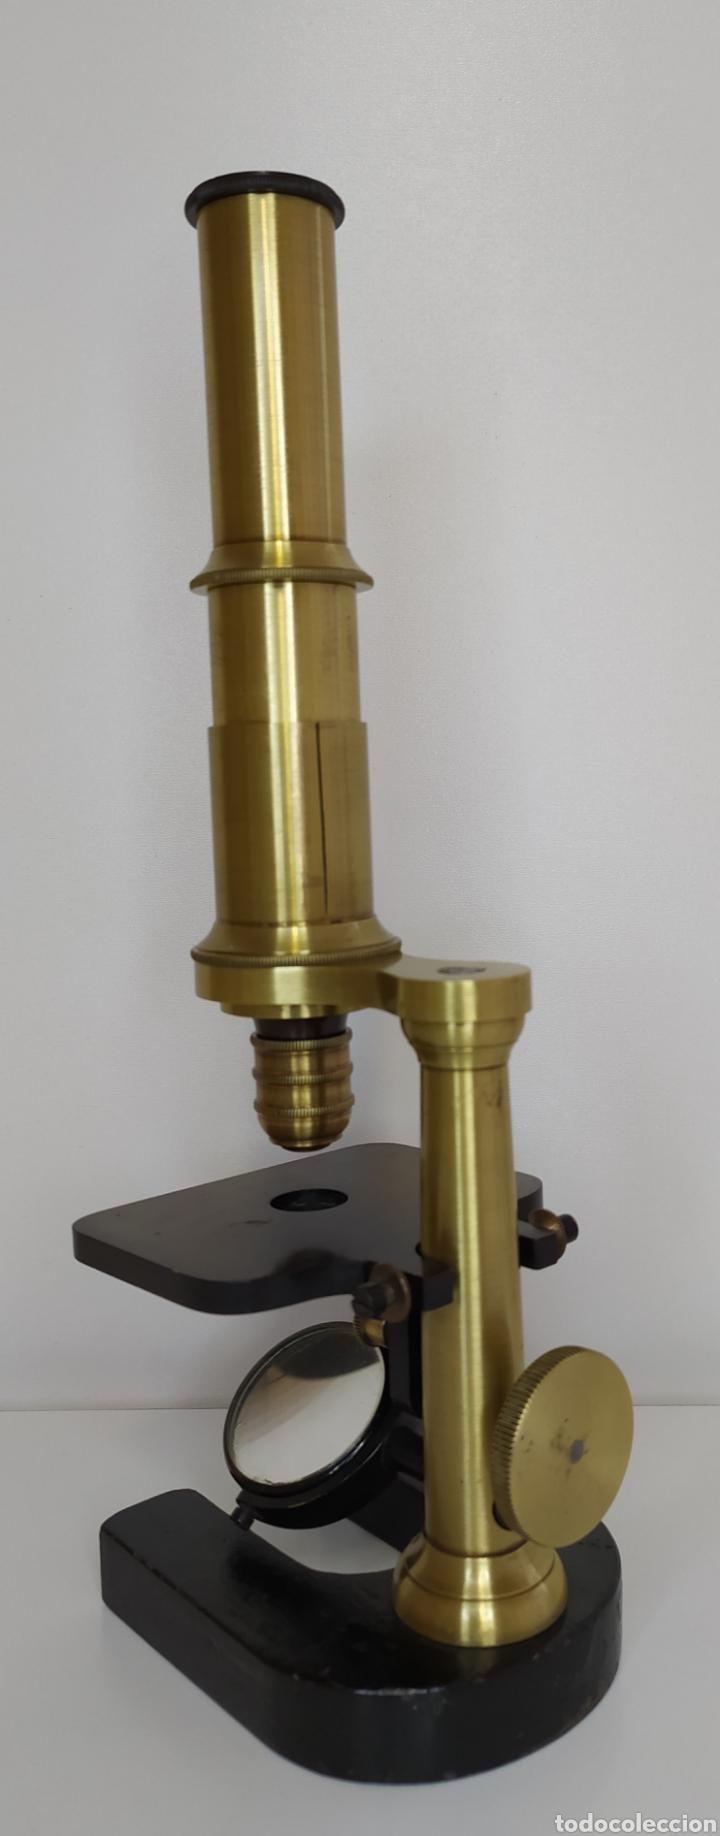 Antigüedades: Antiguo microscopio circa 1880. Tipo Schiek - Foto 3 - 253829690